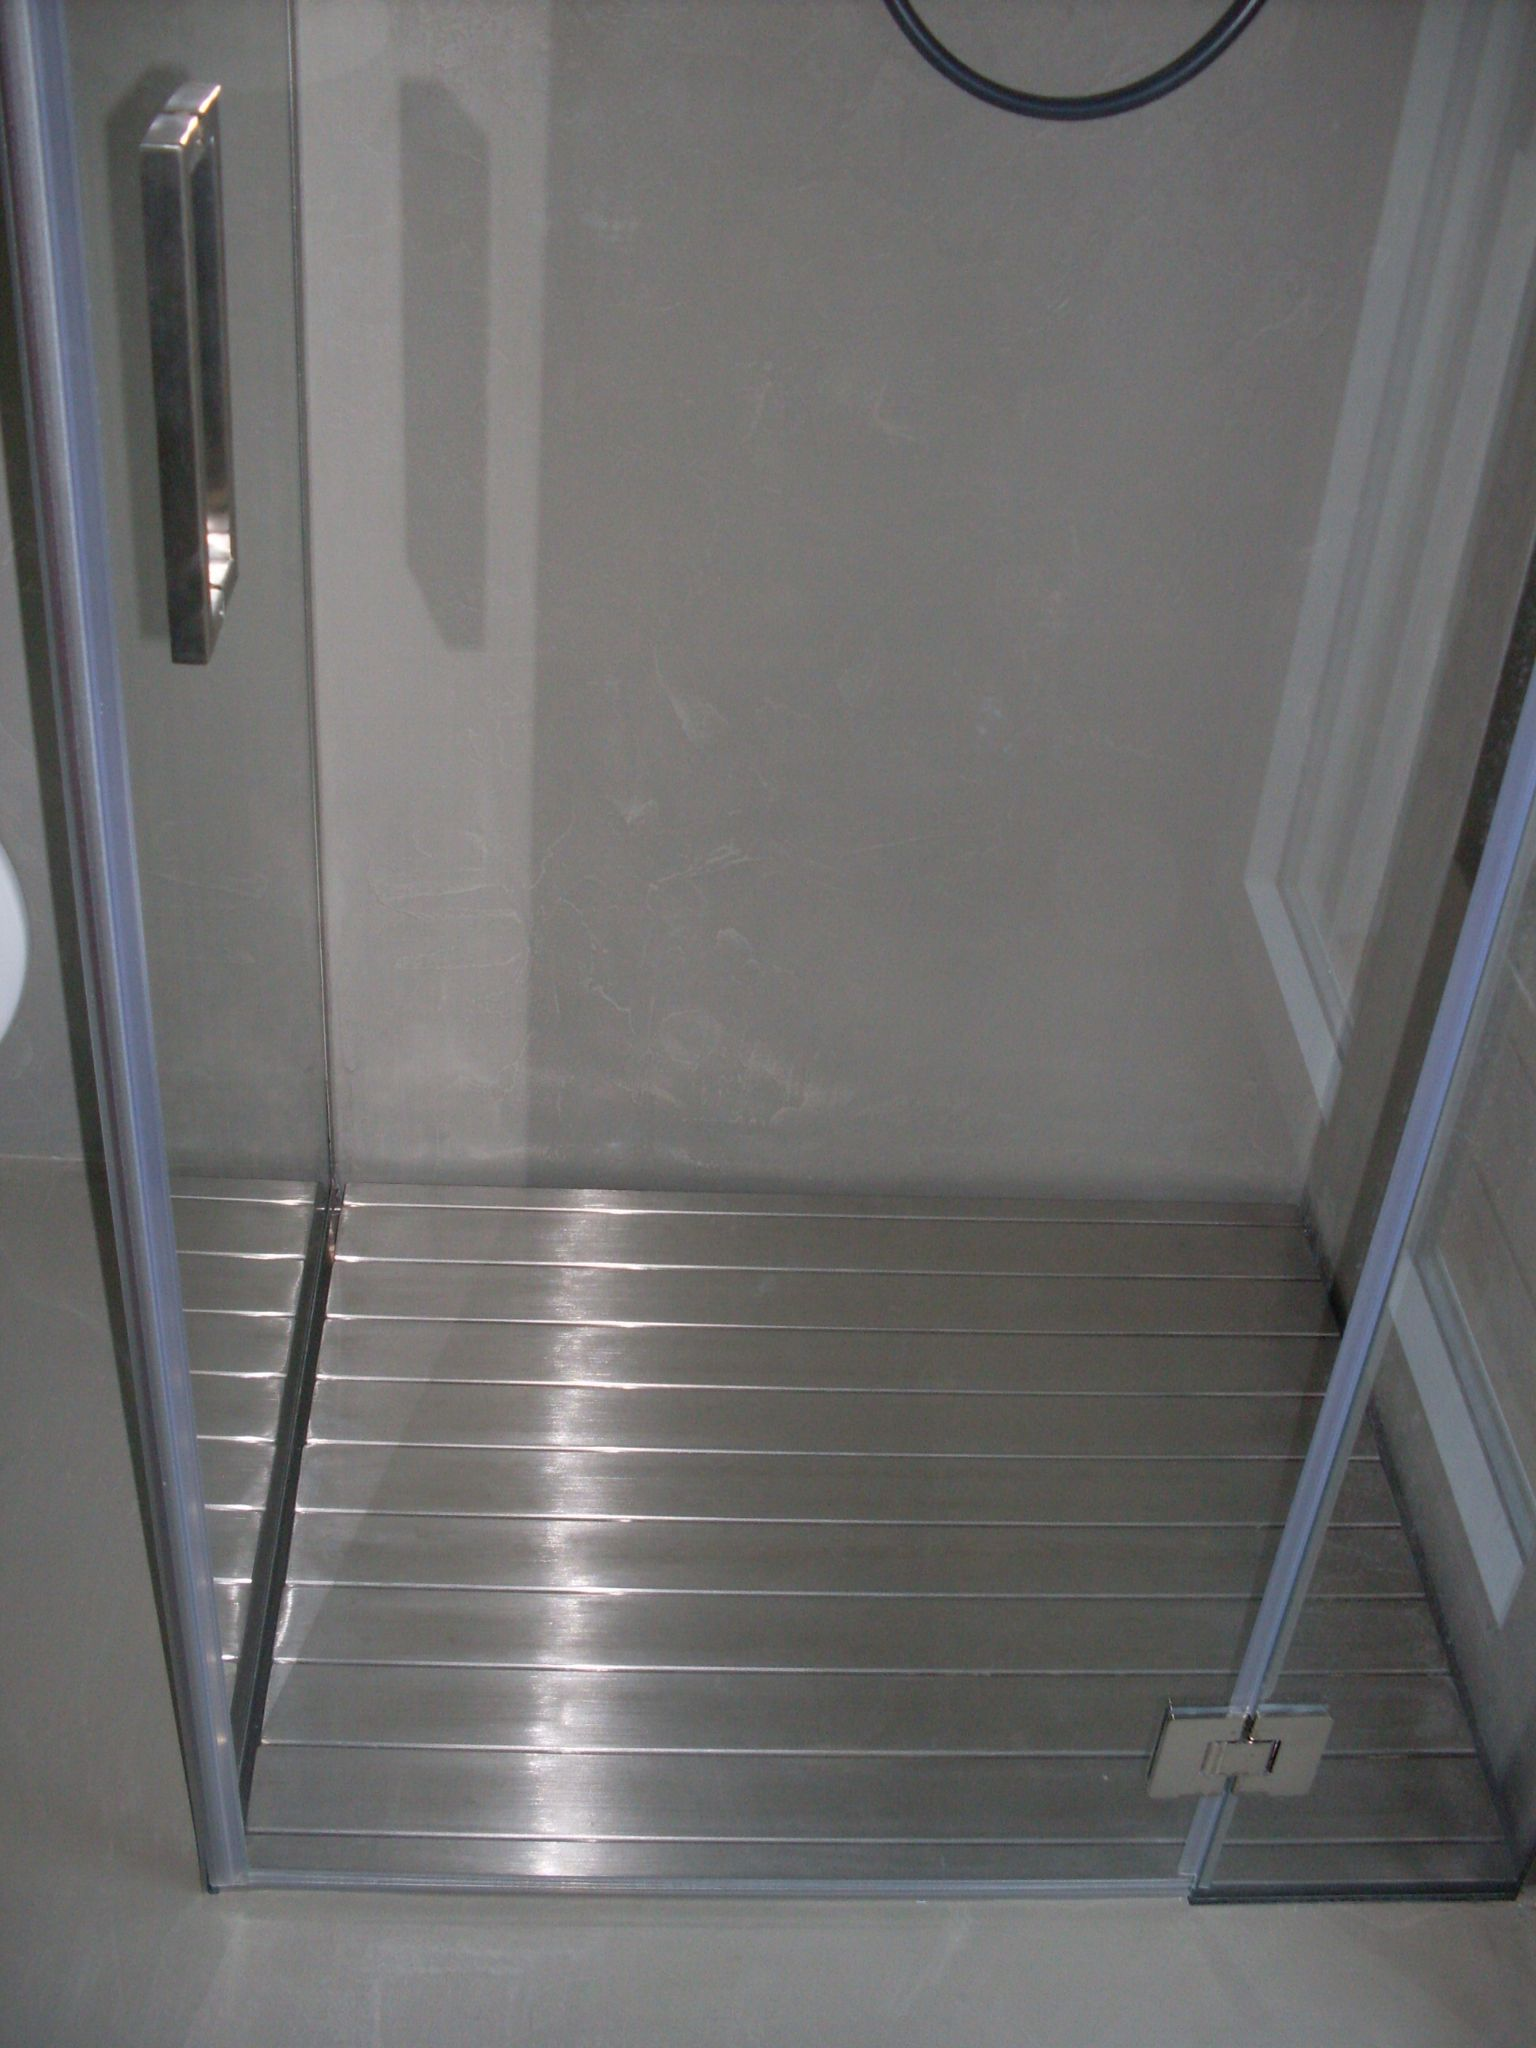 Pedana doccia Matilde in Acciaio Inox resistente di facile